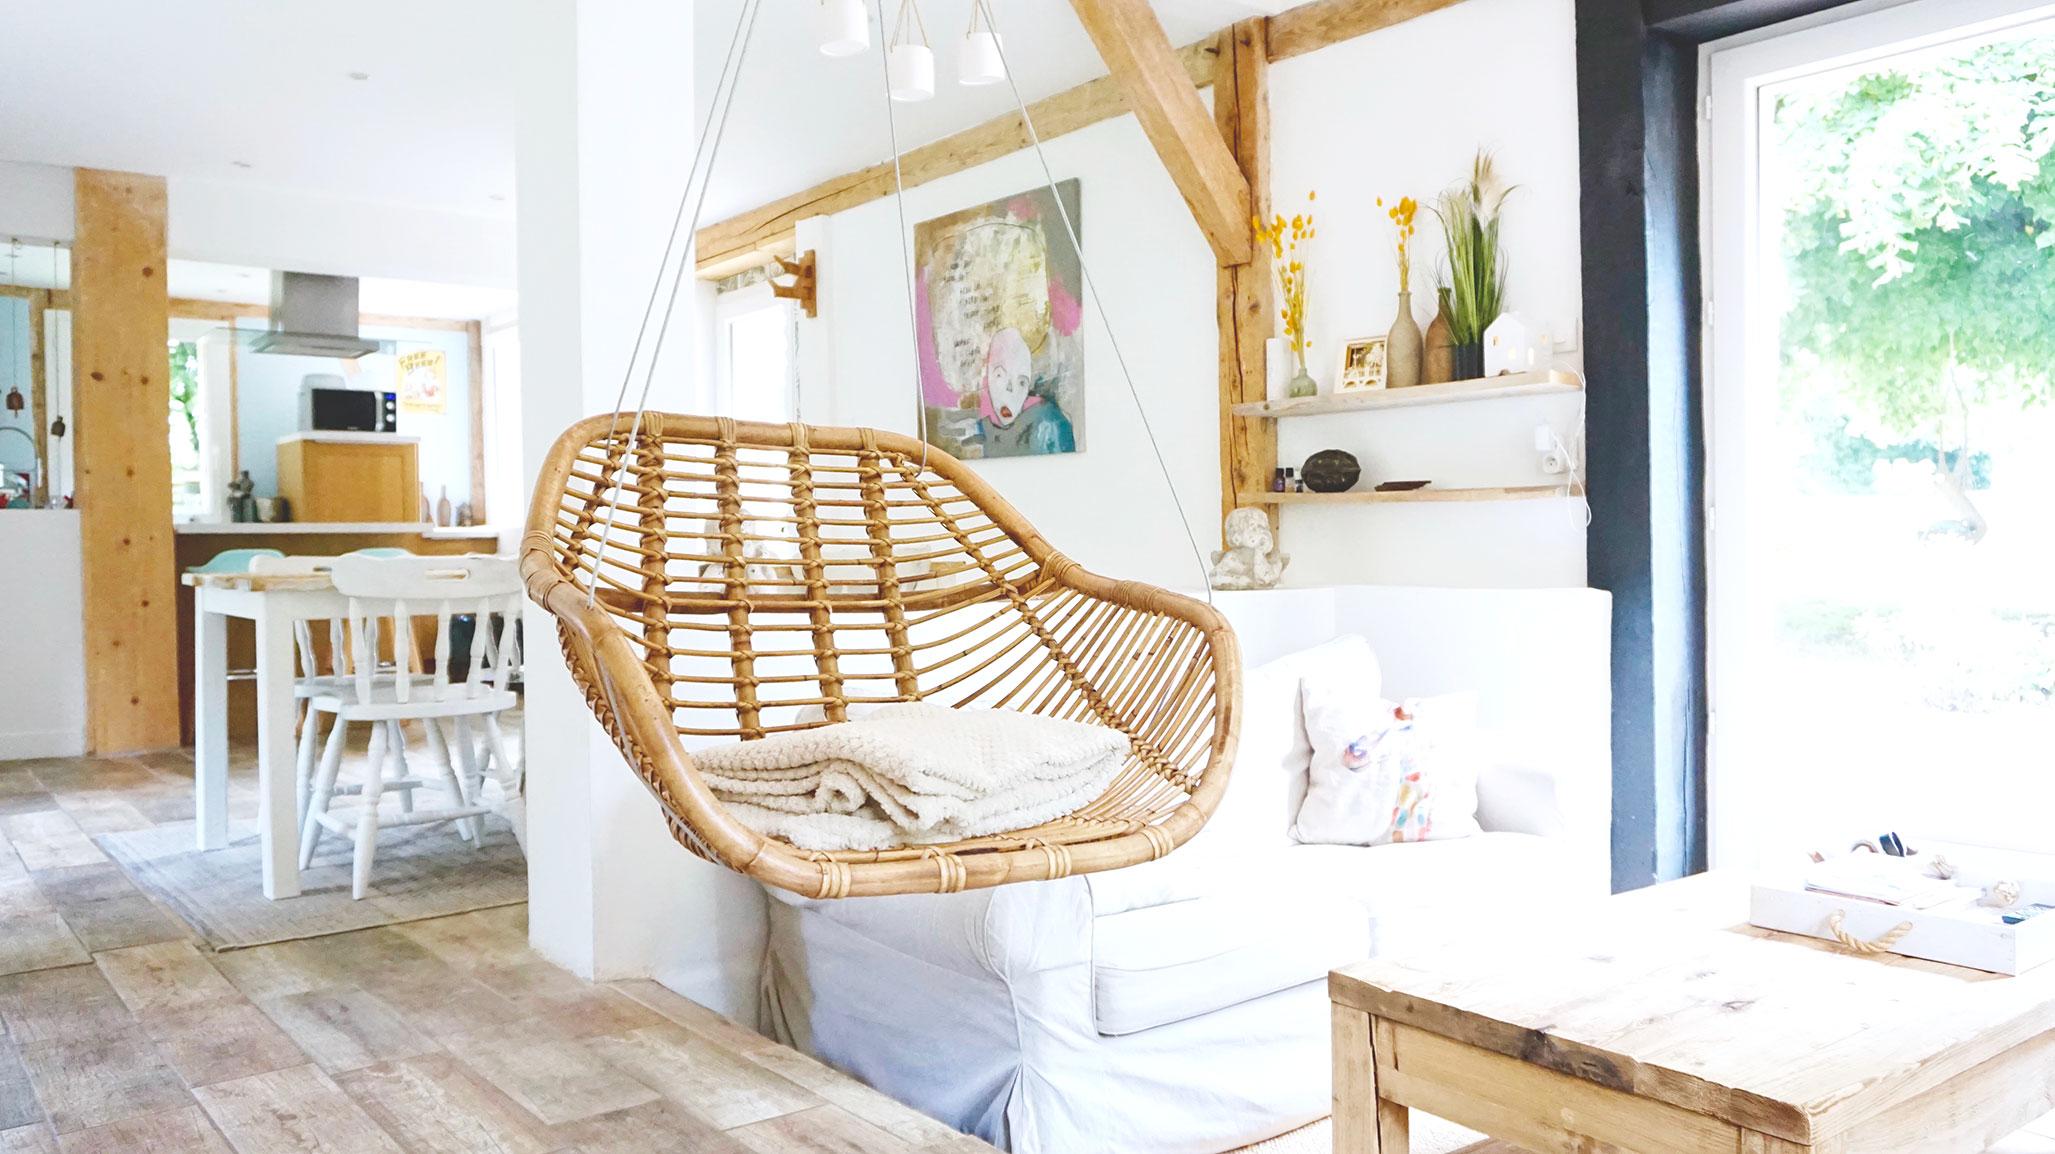 salon-plan-large-location-vacances-locvacances-normandie-vacancesennormandie